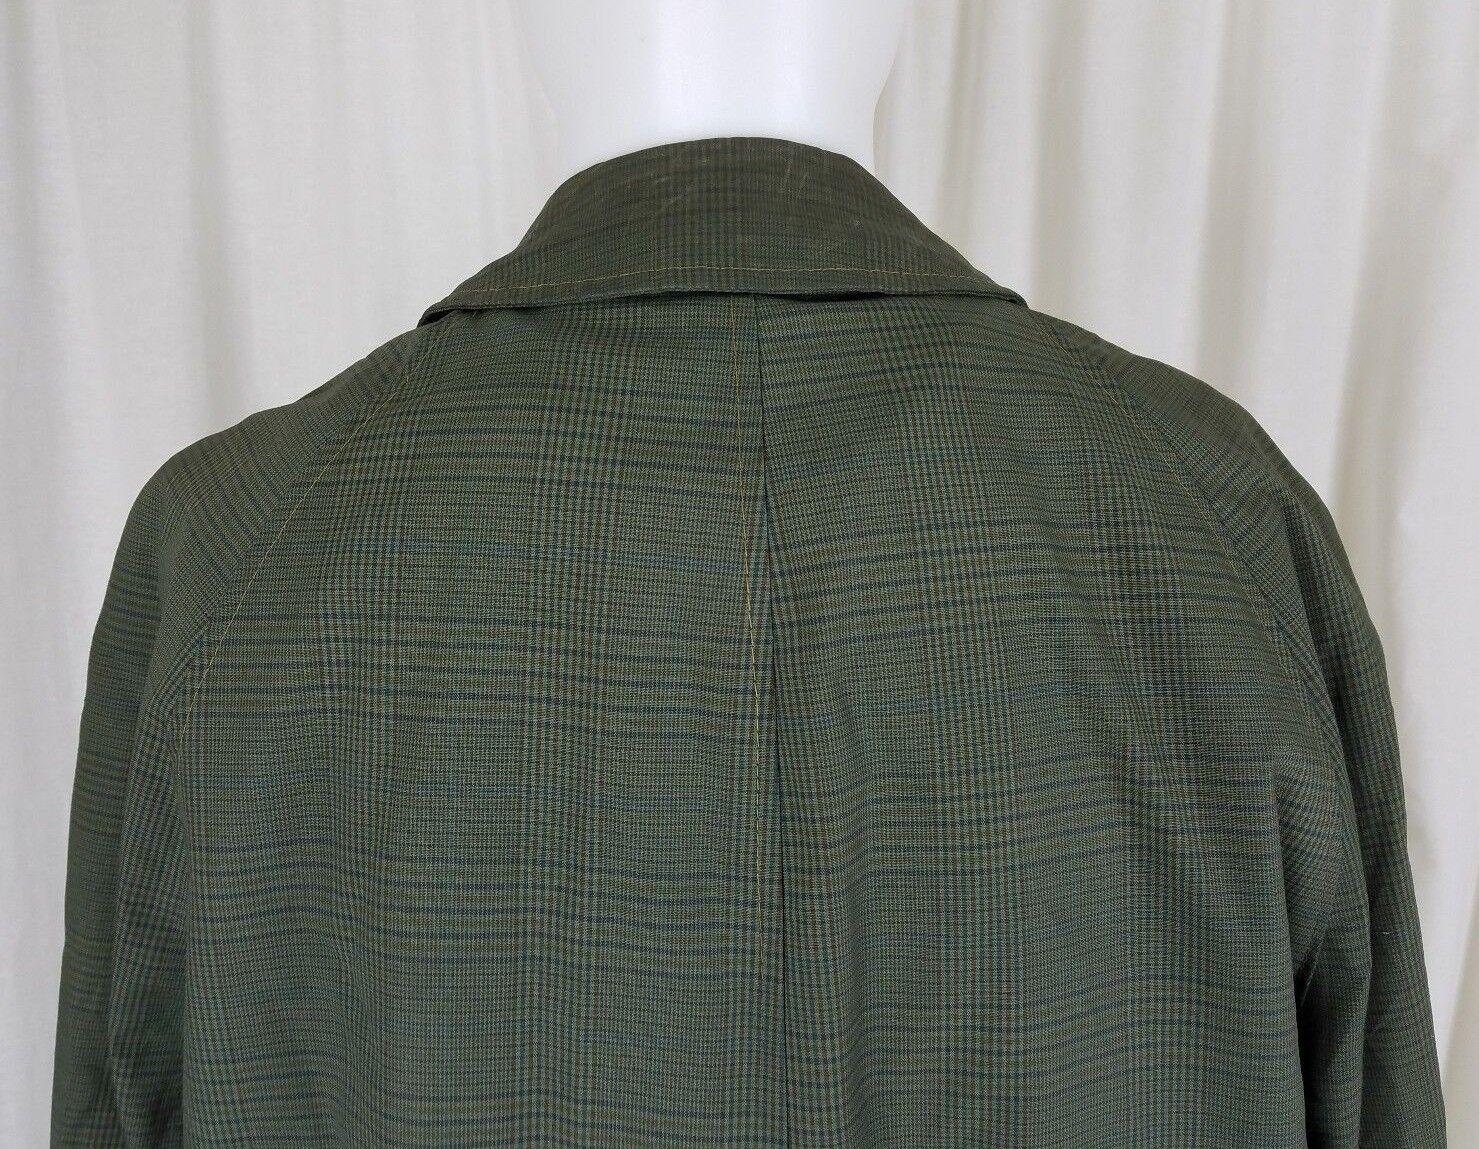 Vintage Grün Kariert 70s Jahre Isoliert Isoliert Isoliert Tief Flor Pelzfutter Schlitz Trenchcoat   Exquisite Verarbeitung  15d607